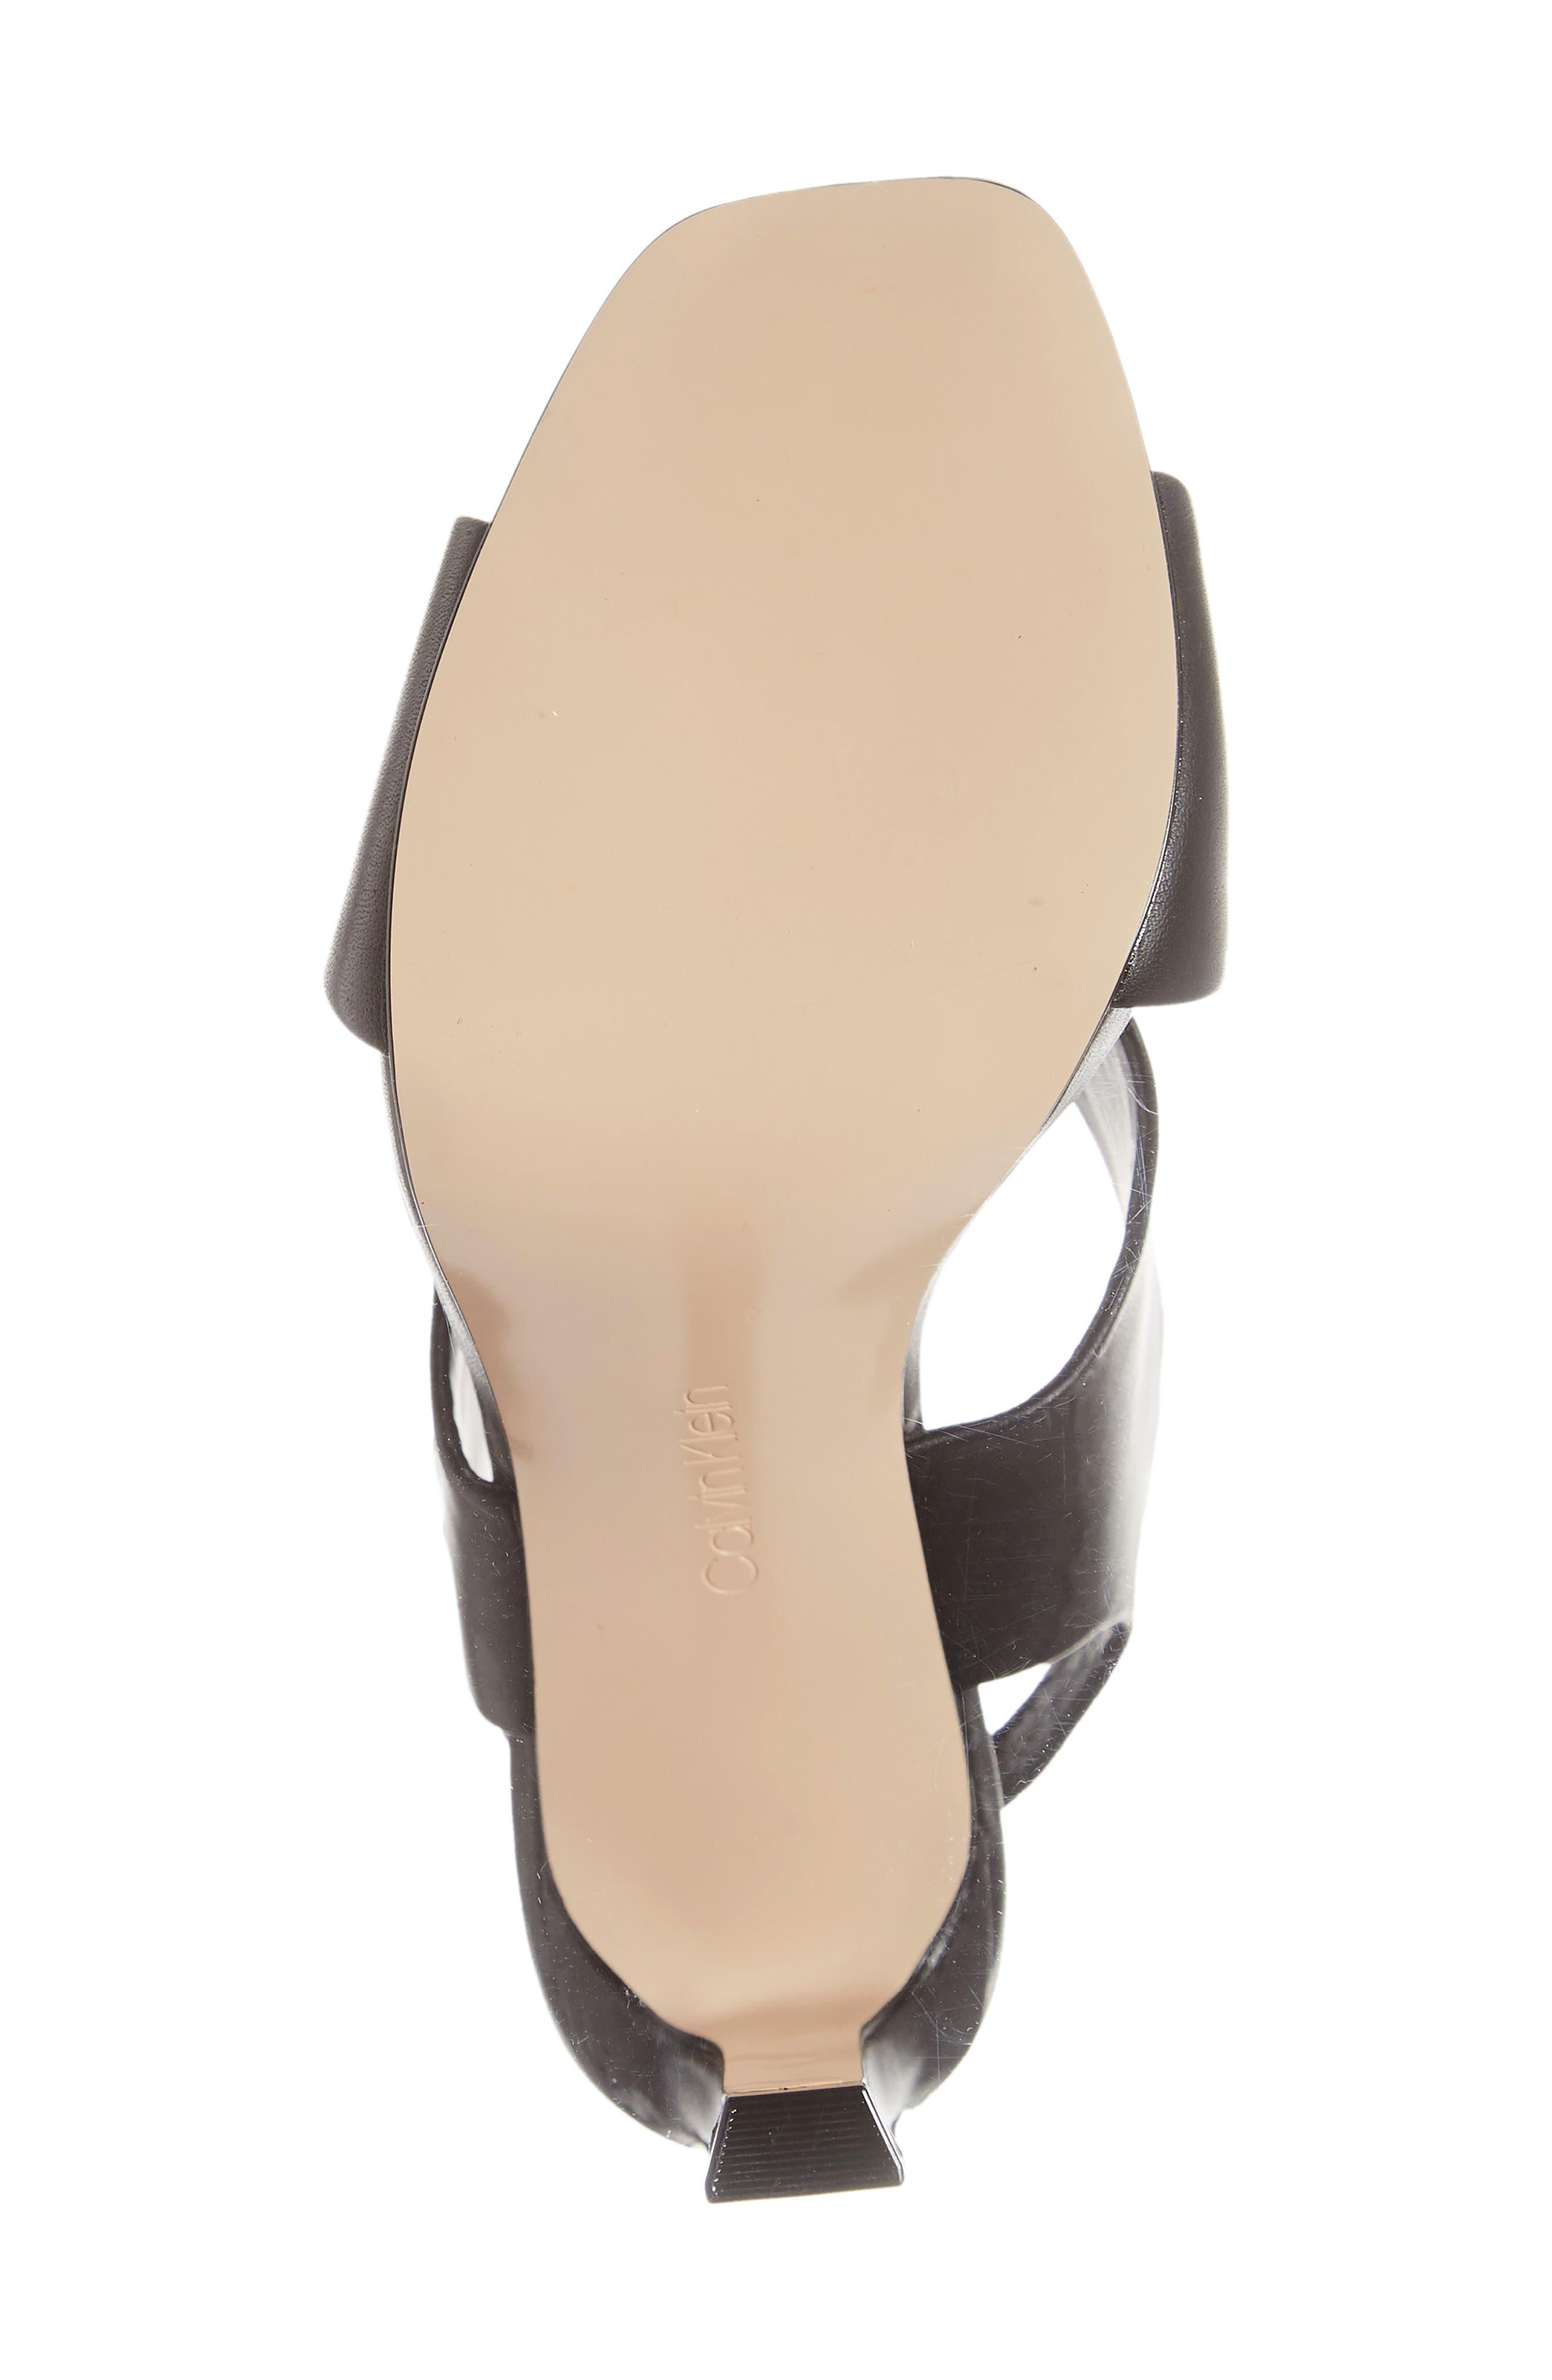 Myra Cross Strap Sandal,                             Alternate thumbnail 6, color,                             BLACK LEATHER